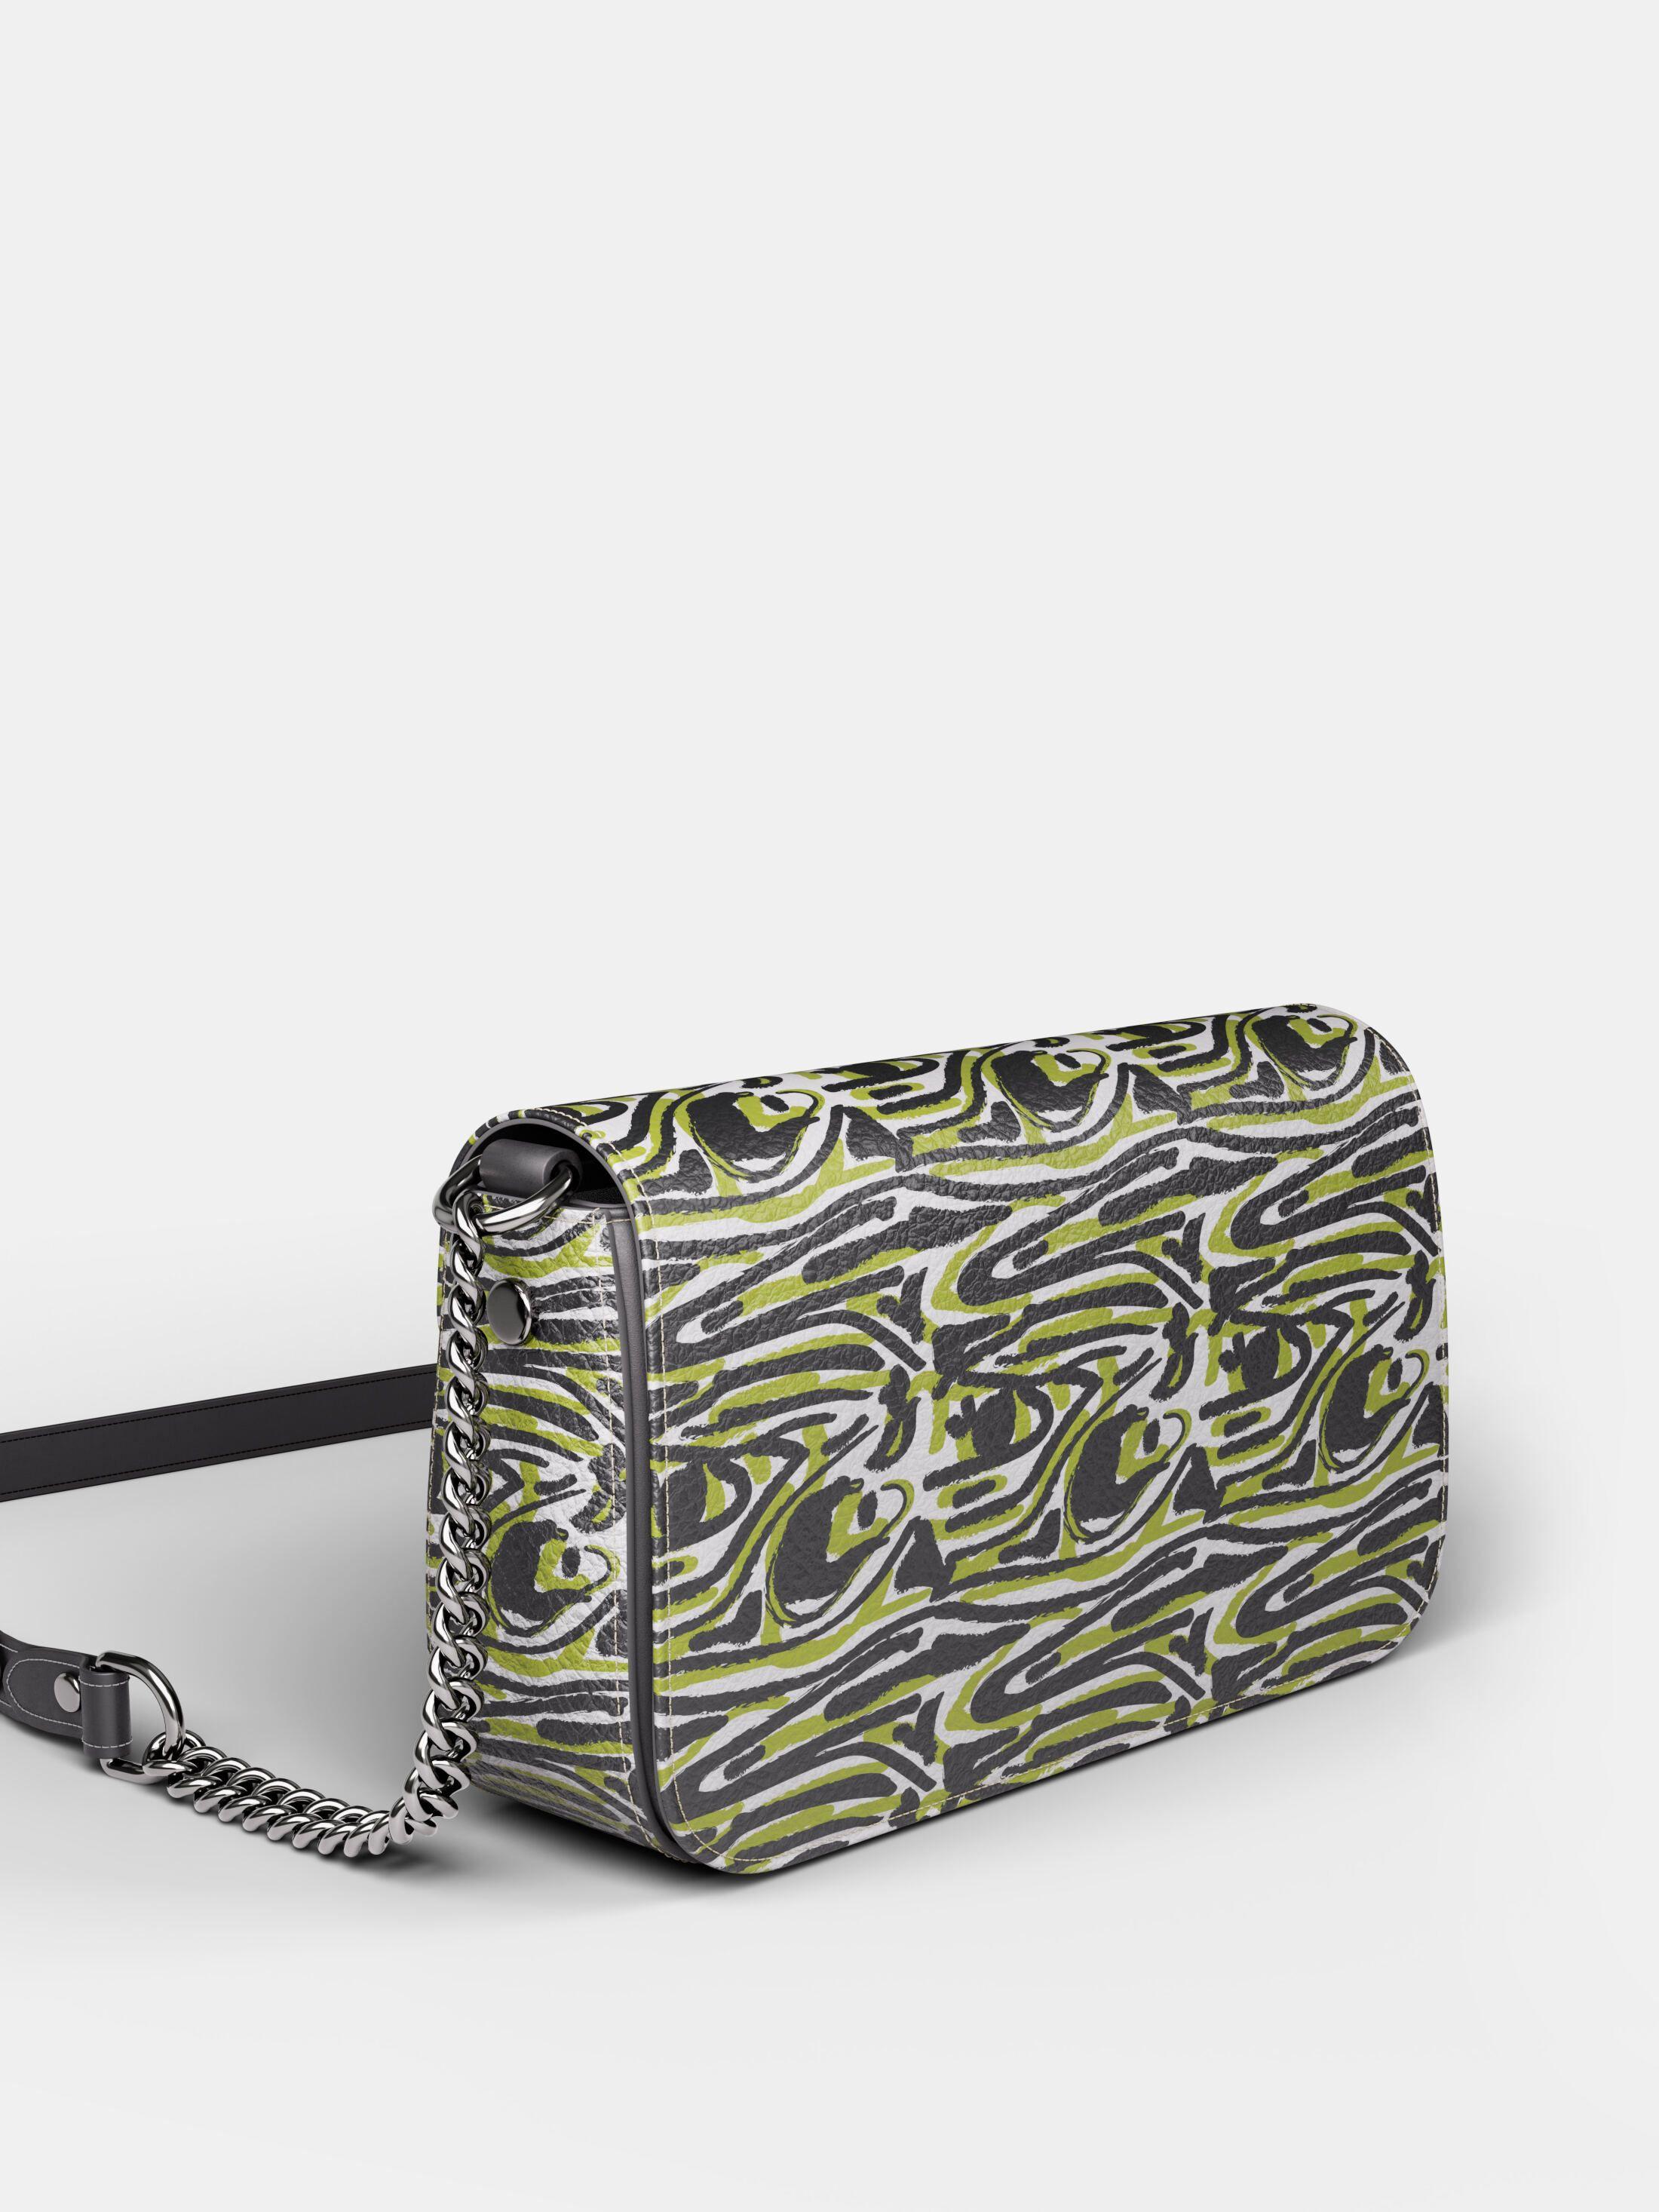 Foldover-Abendtasche personalisieren